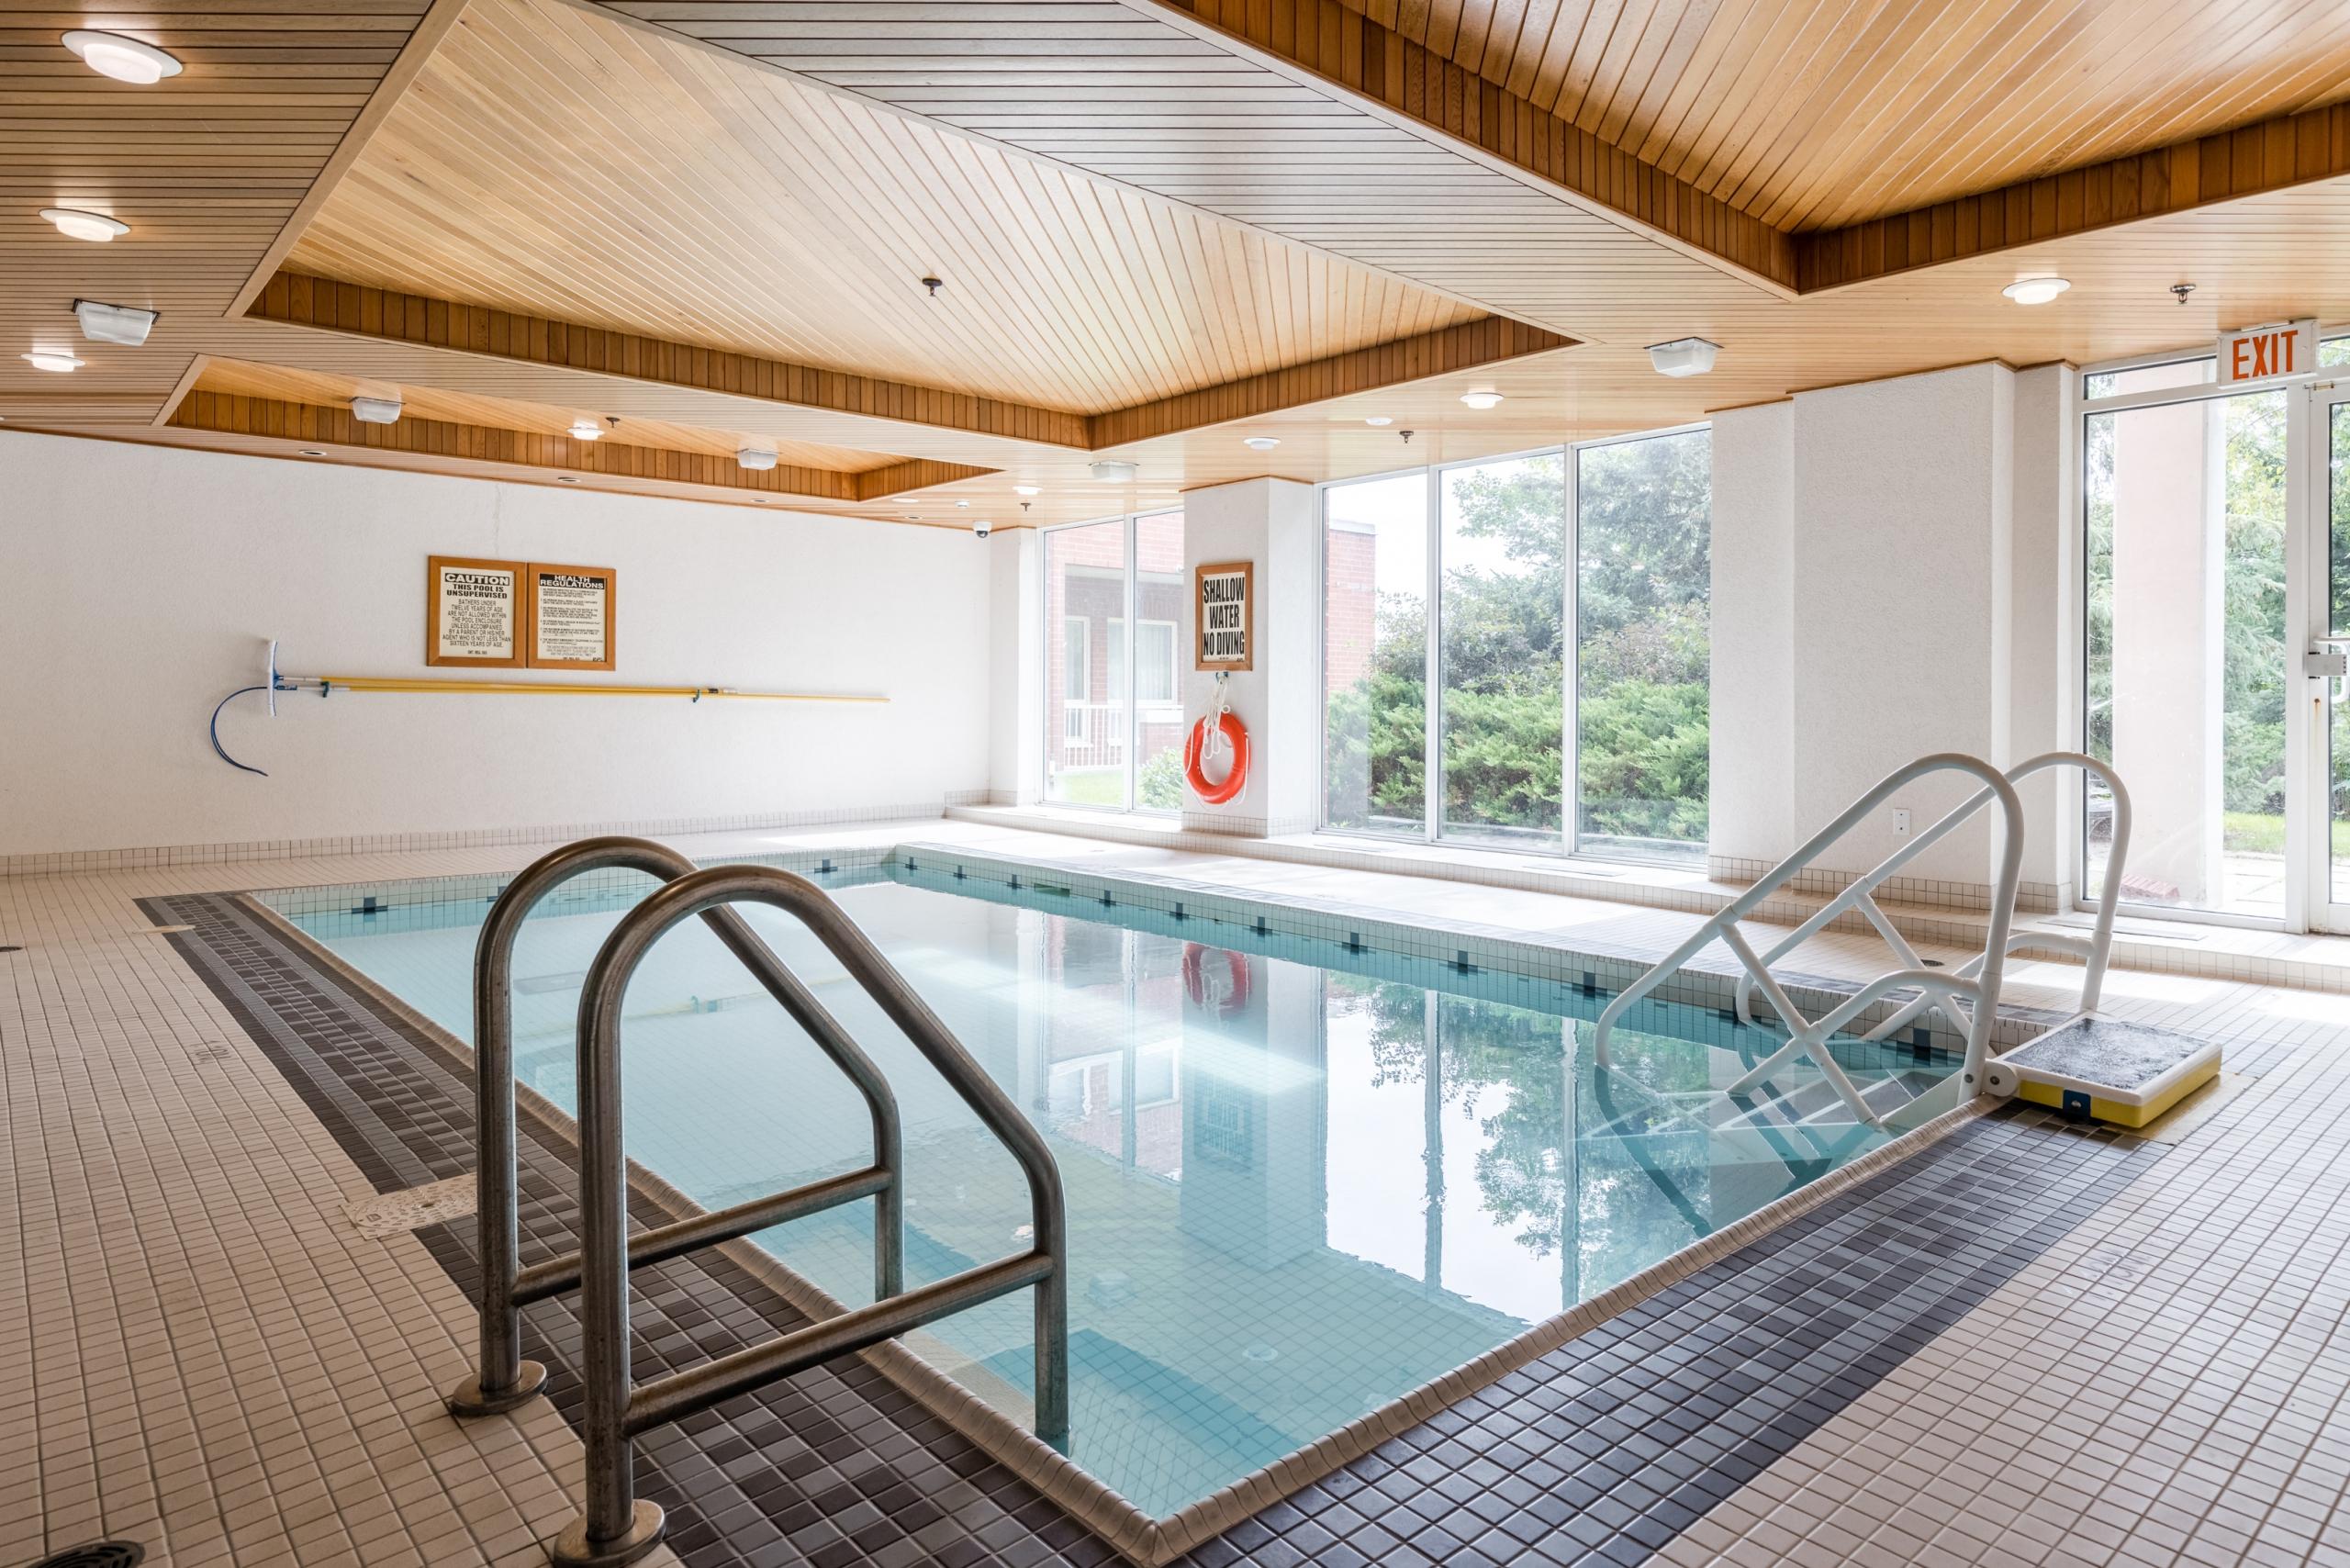 Swimming pool featured at 508-40 Old Mill Road, Oakville at Alex Irish & Associates